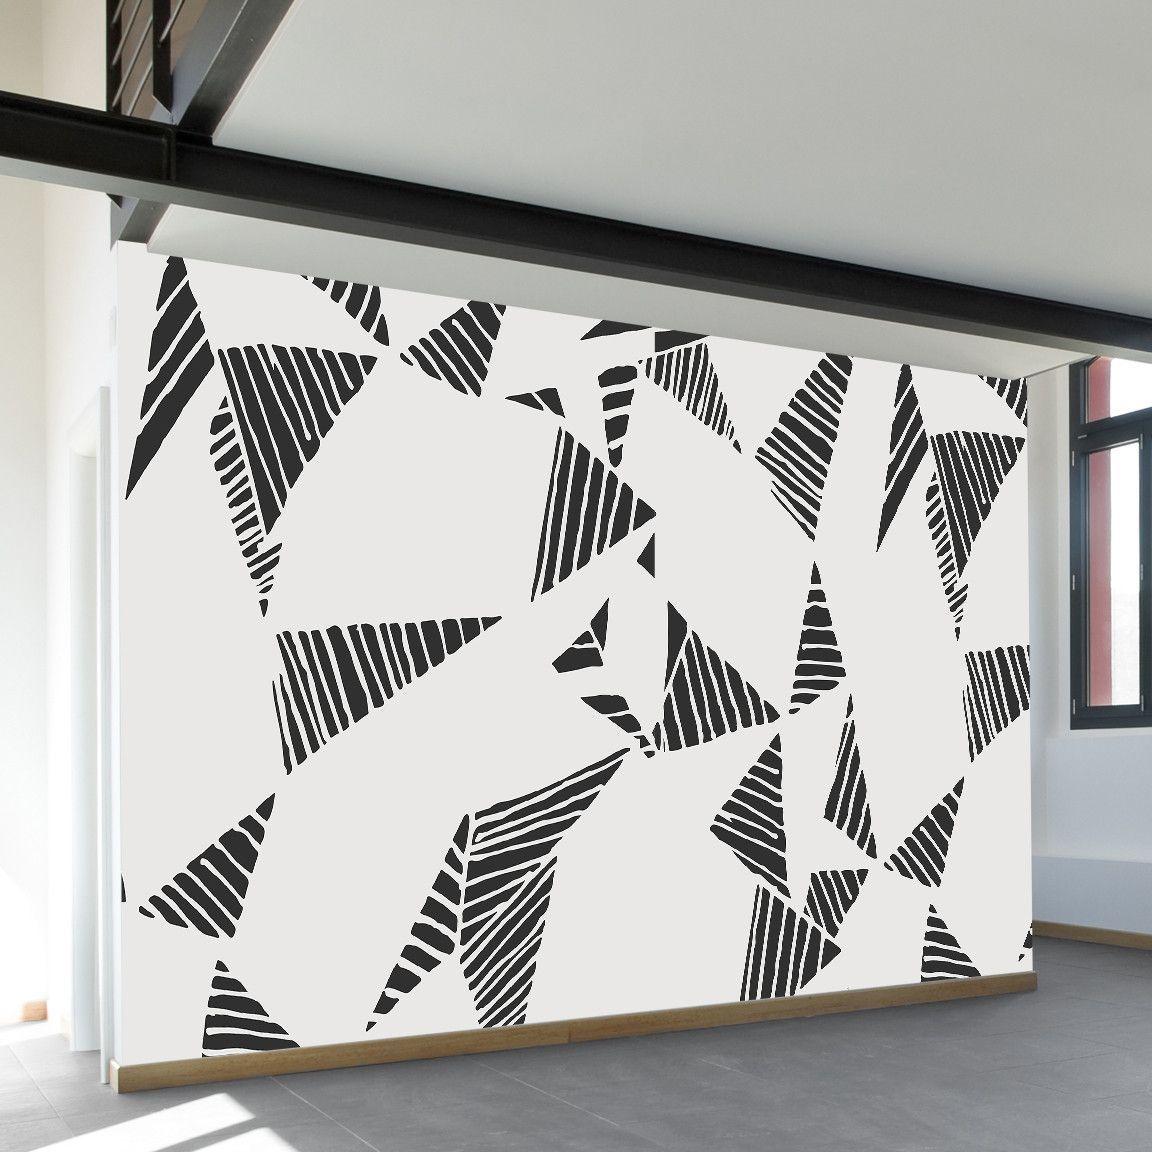 Hand Drawn Geometric Texture Wall Mural Wall Murals Removable Wall Murals Wall Patterns